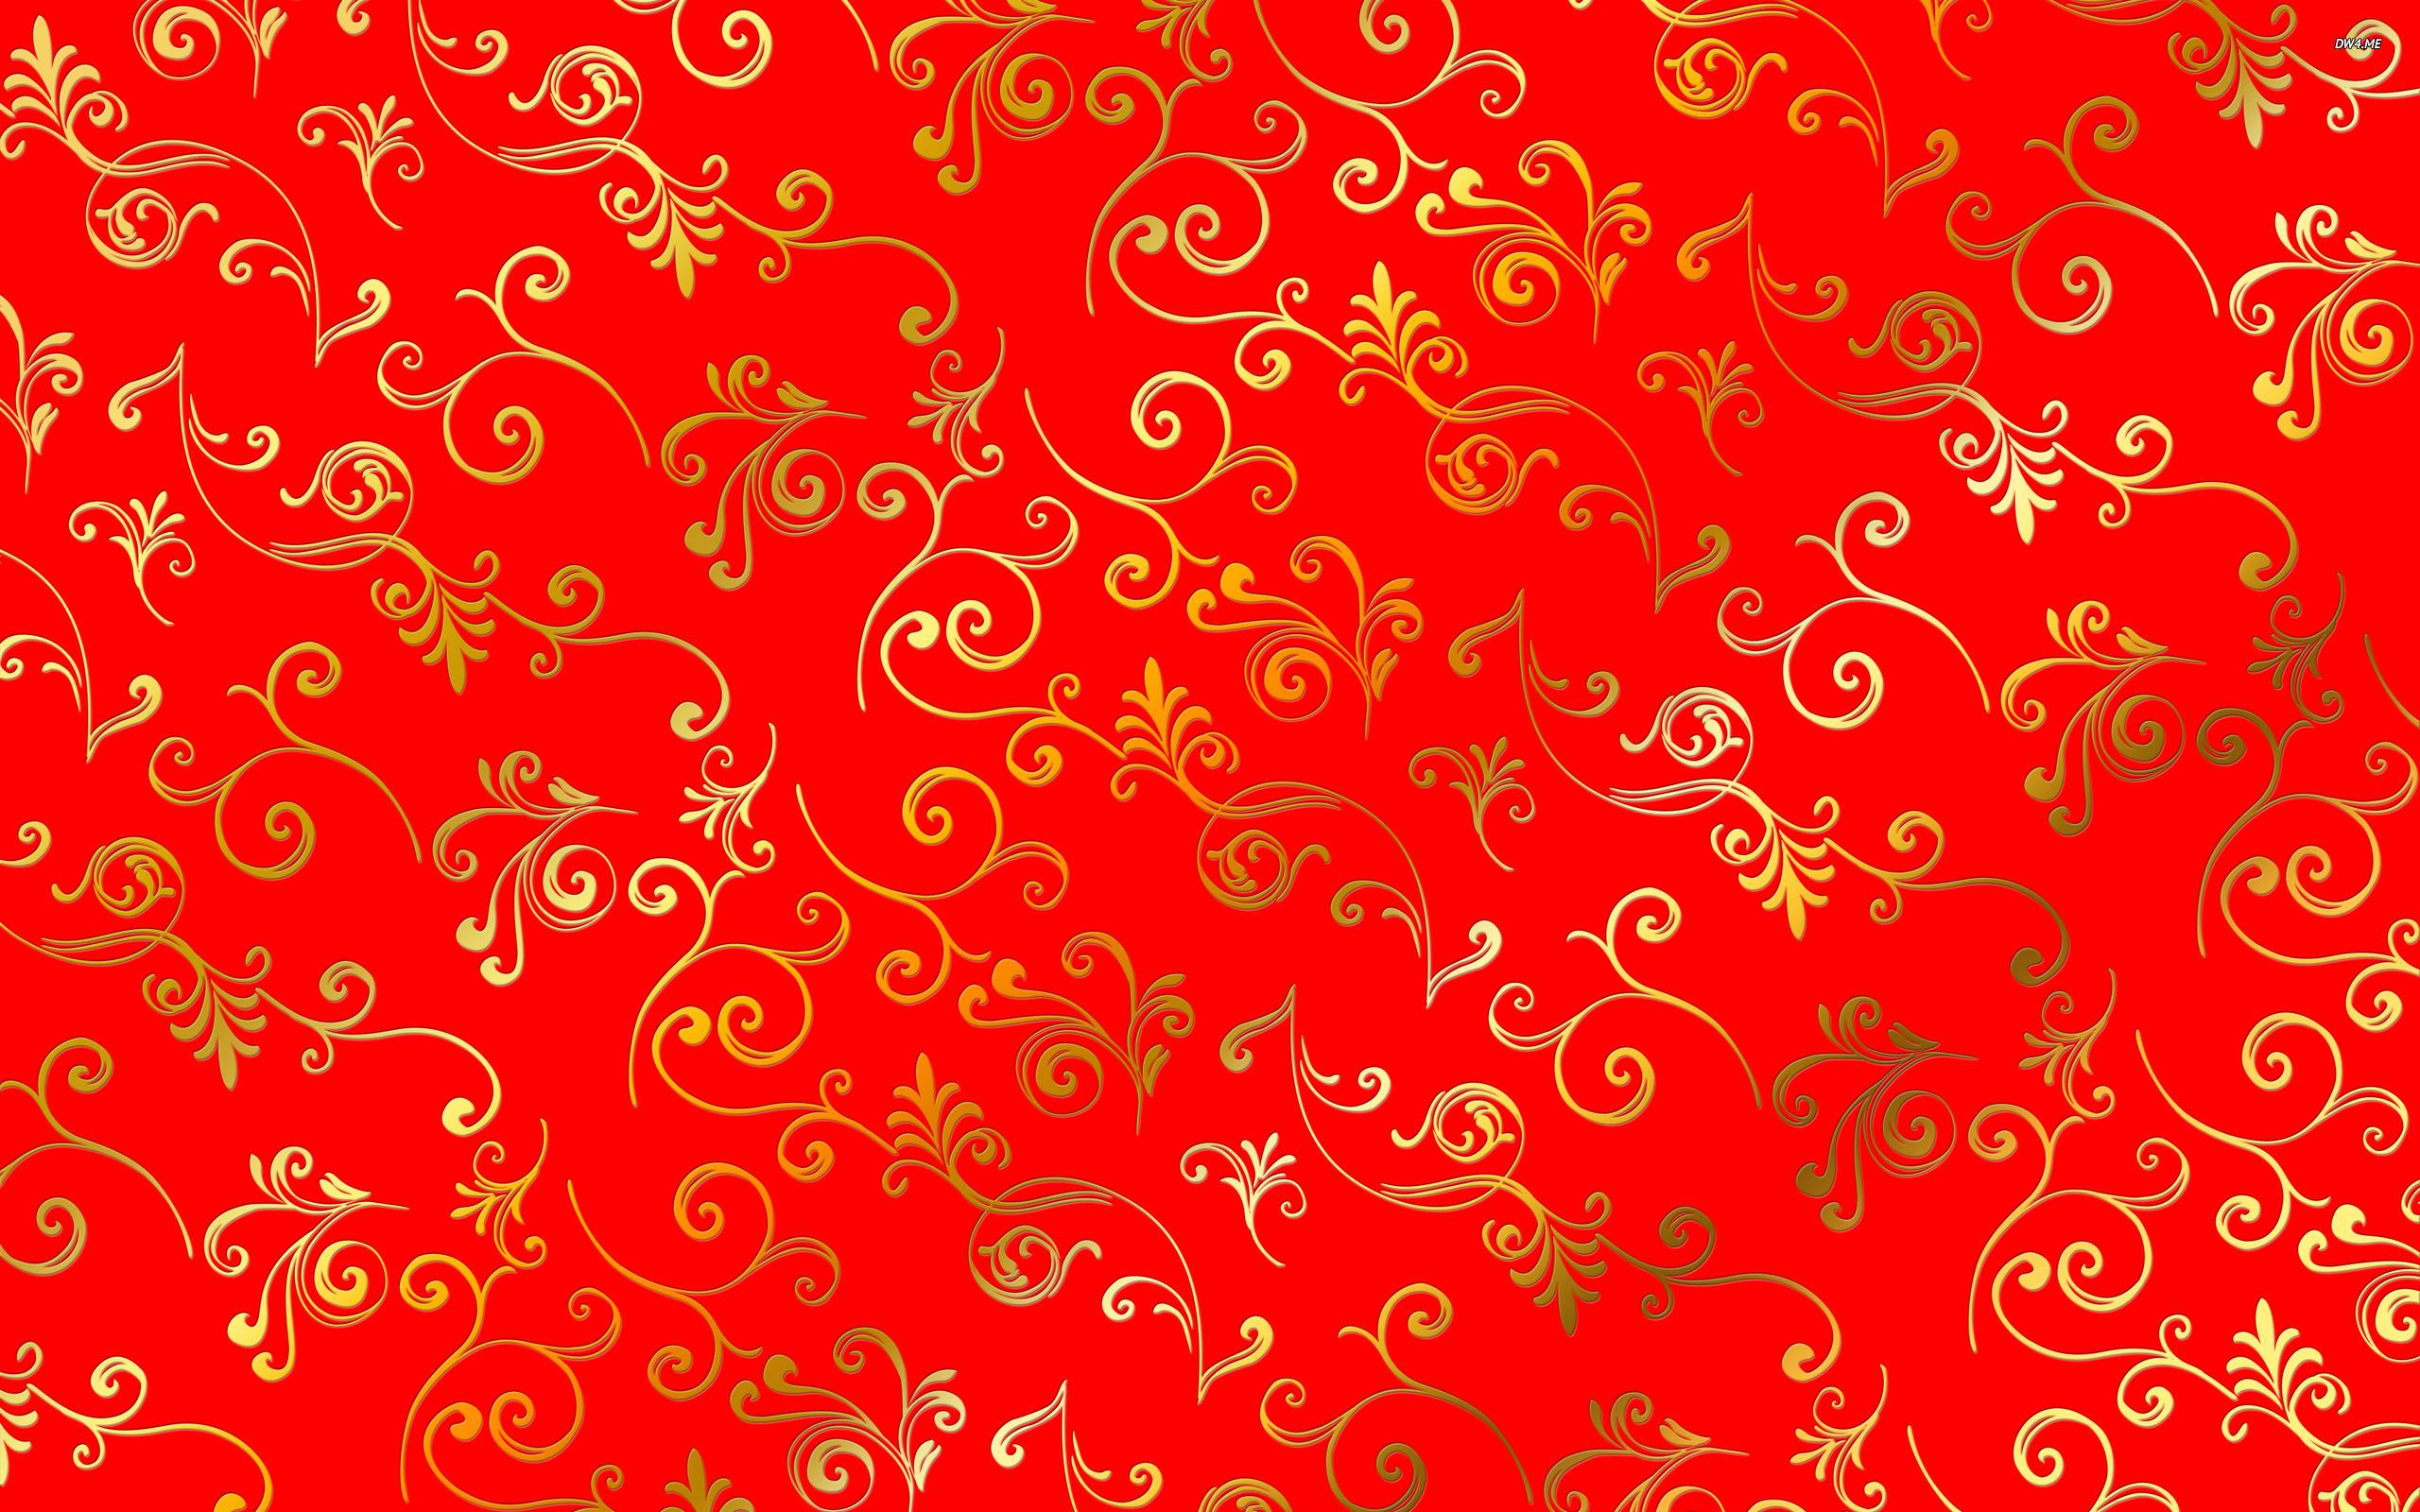 Golden swirl pattern wallpaper   Vector wallpapers   975 2560x1600